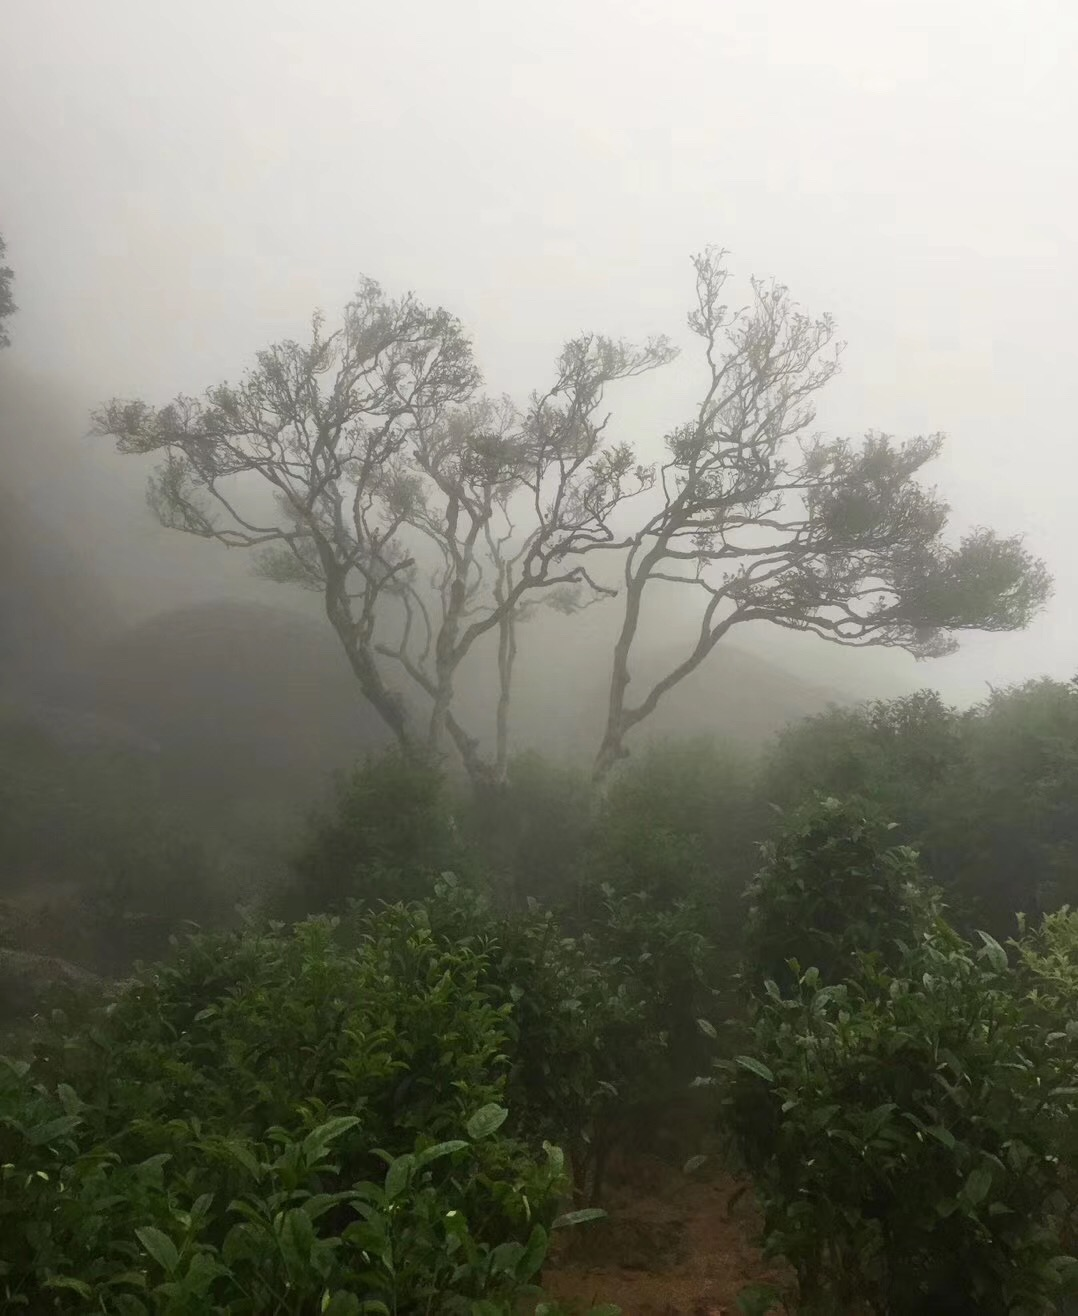 Yunnan mountain old tree tea chinese black tea bondong puer tea - 4uTea | 4uTea.com